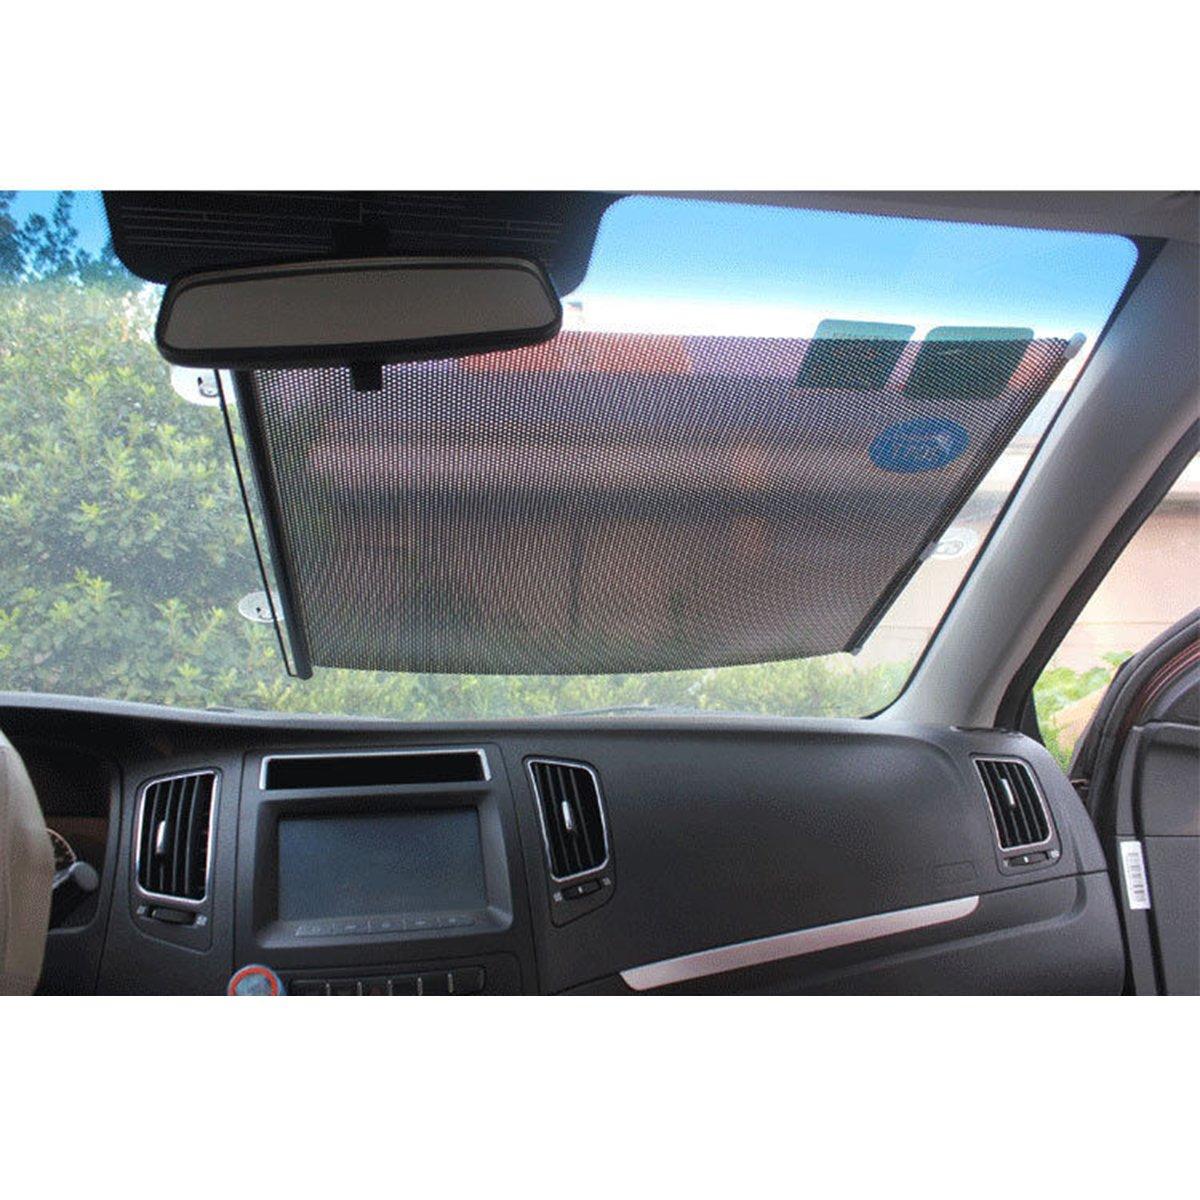 uxcell 2pcs Black Car Sun Shade Side Nylon Mesh Window Curtain Foldable Sunshade UV Protection 43 x 46cm